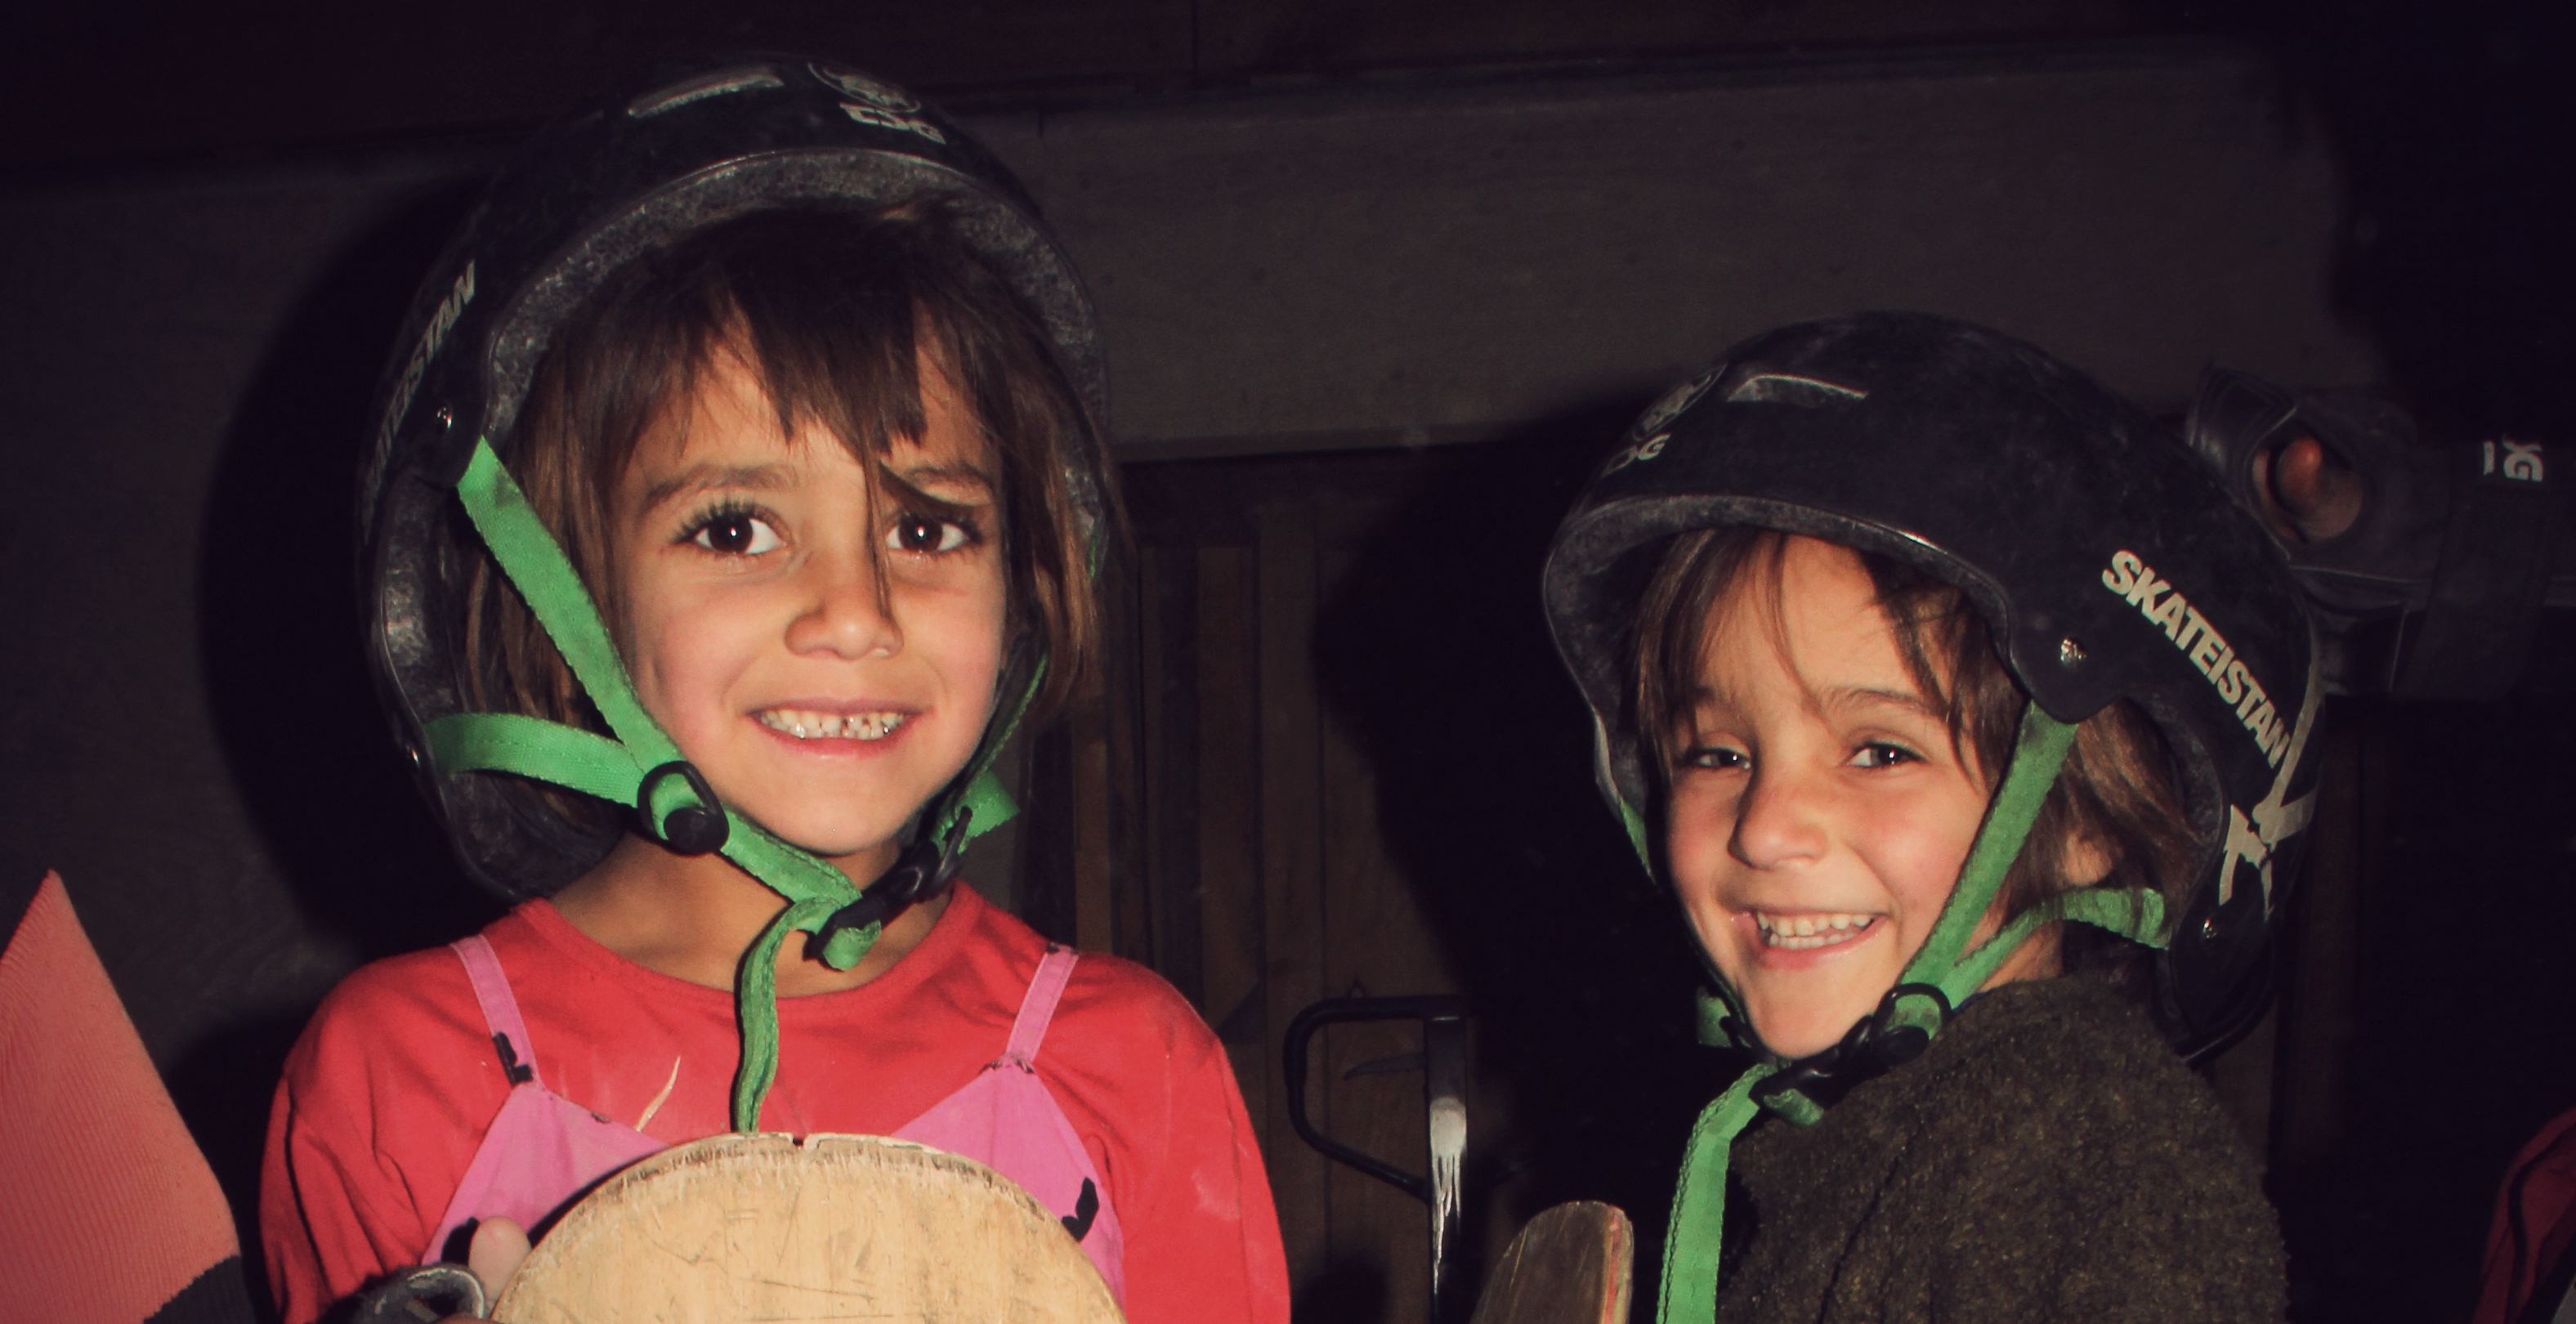 learning to skate in a war zone skateistan girls on skateboard